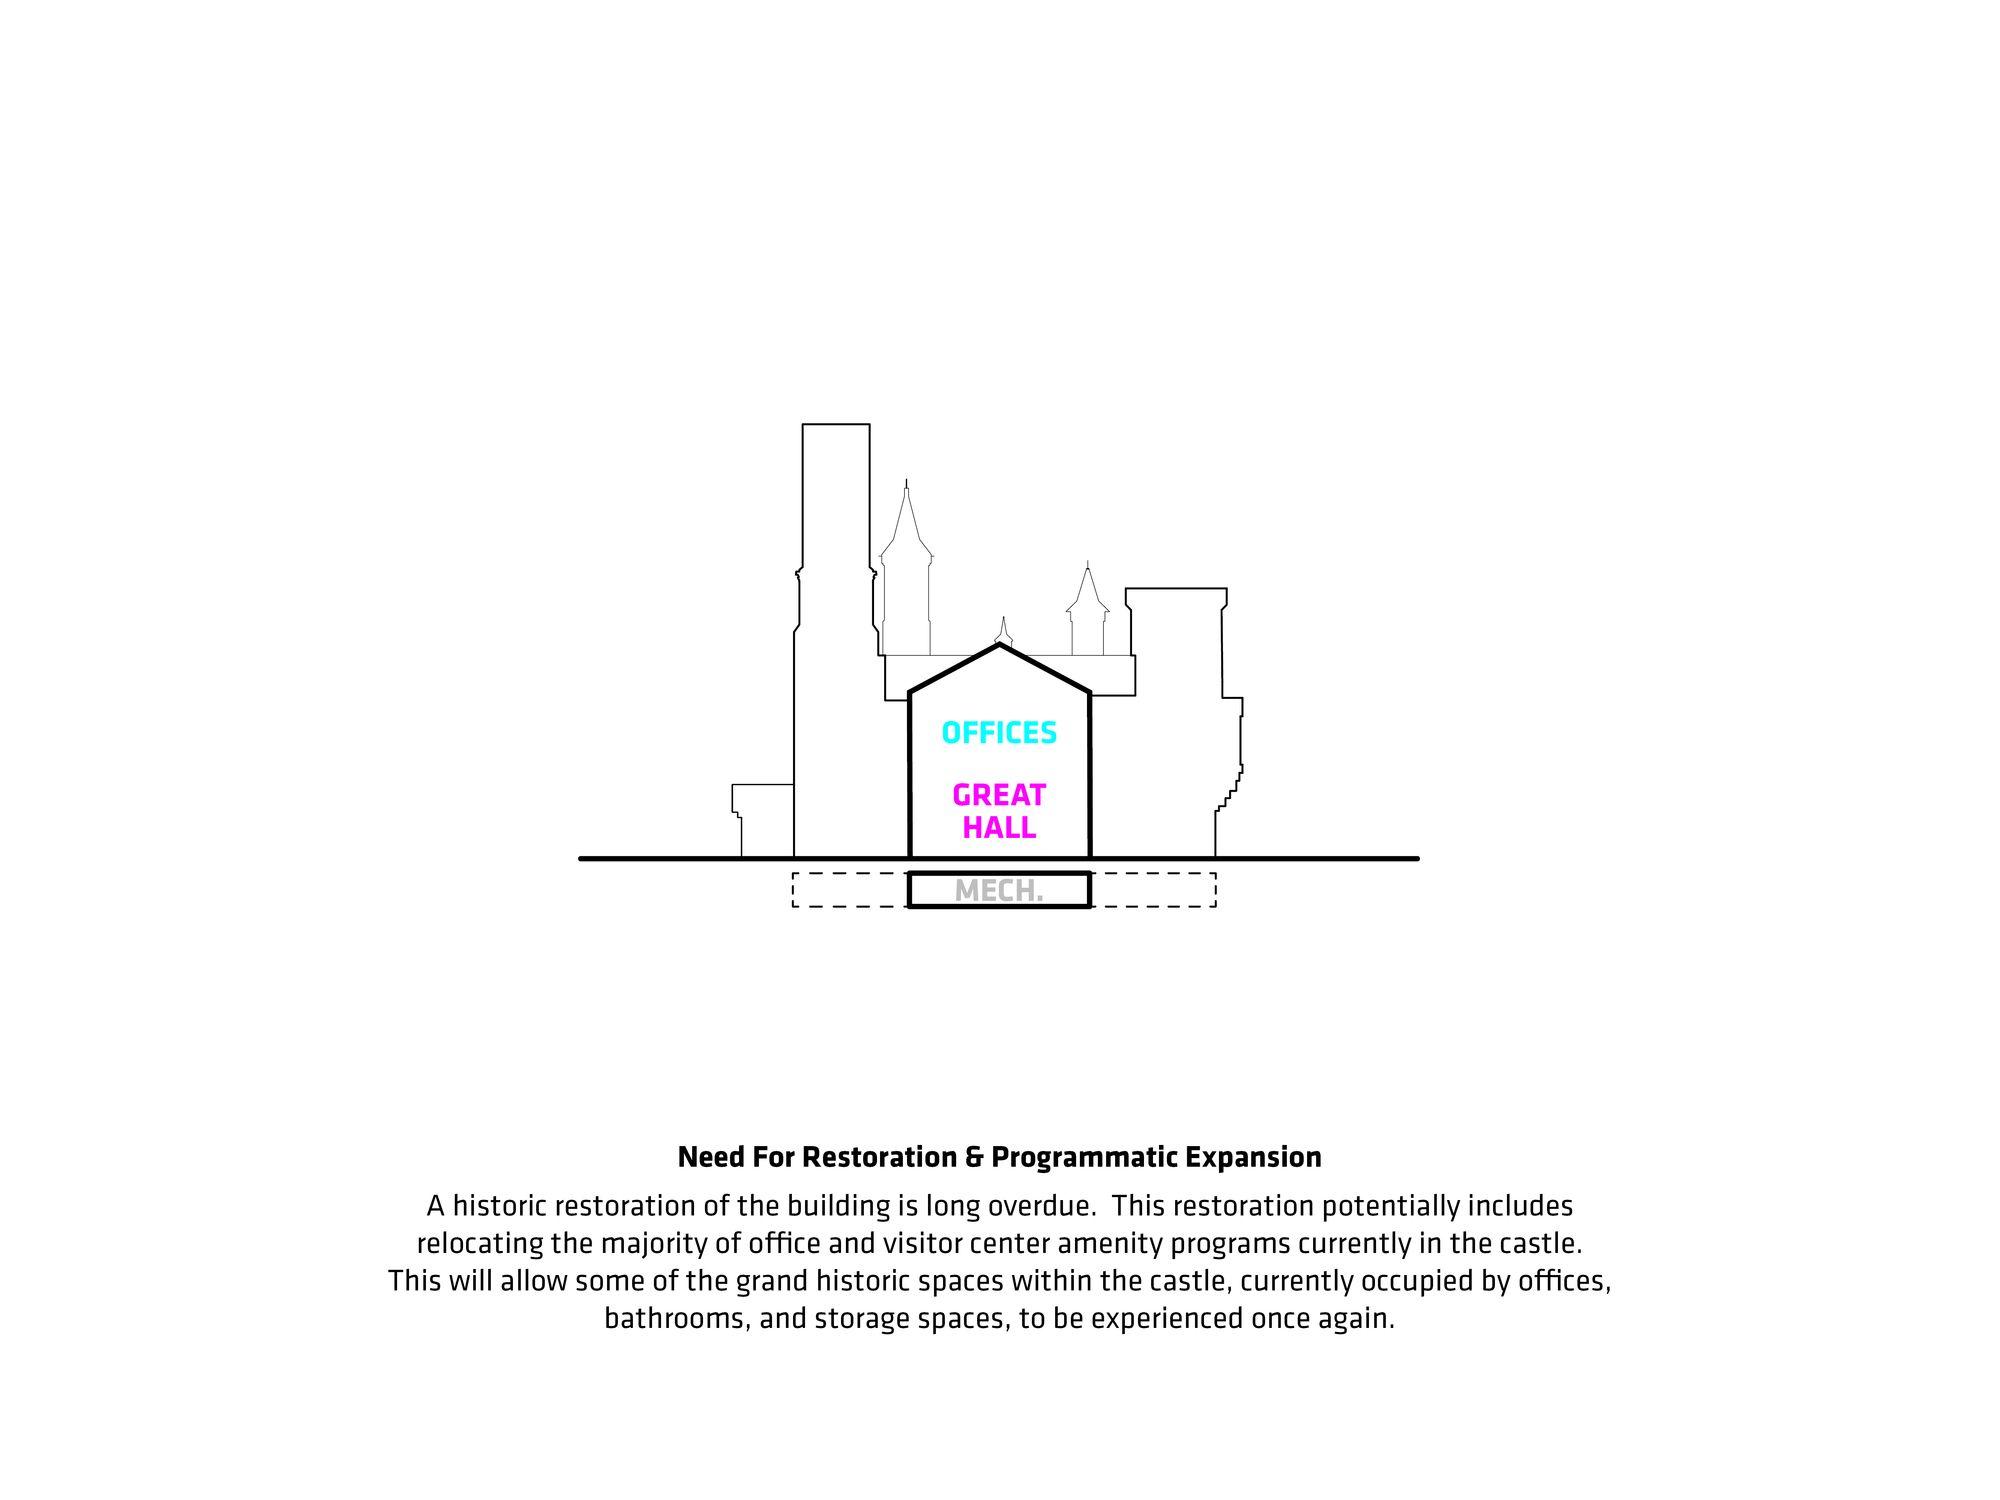 18-restoration-and-programmatic-expansion_original.jpg (2000×1500)